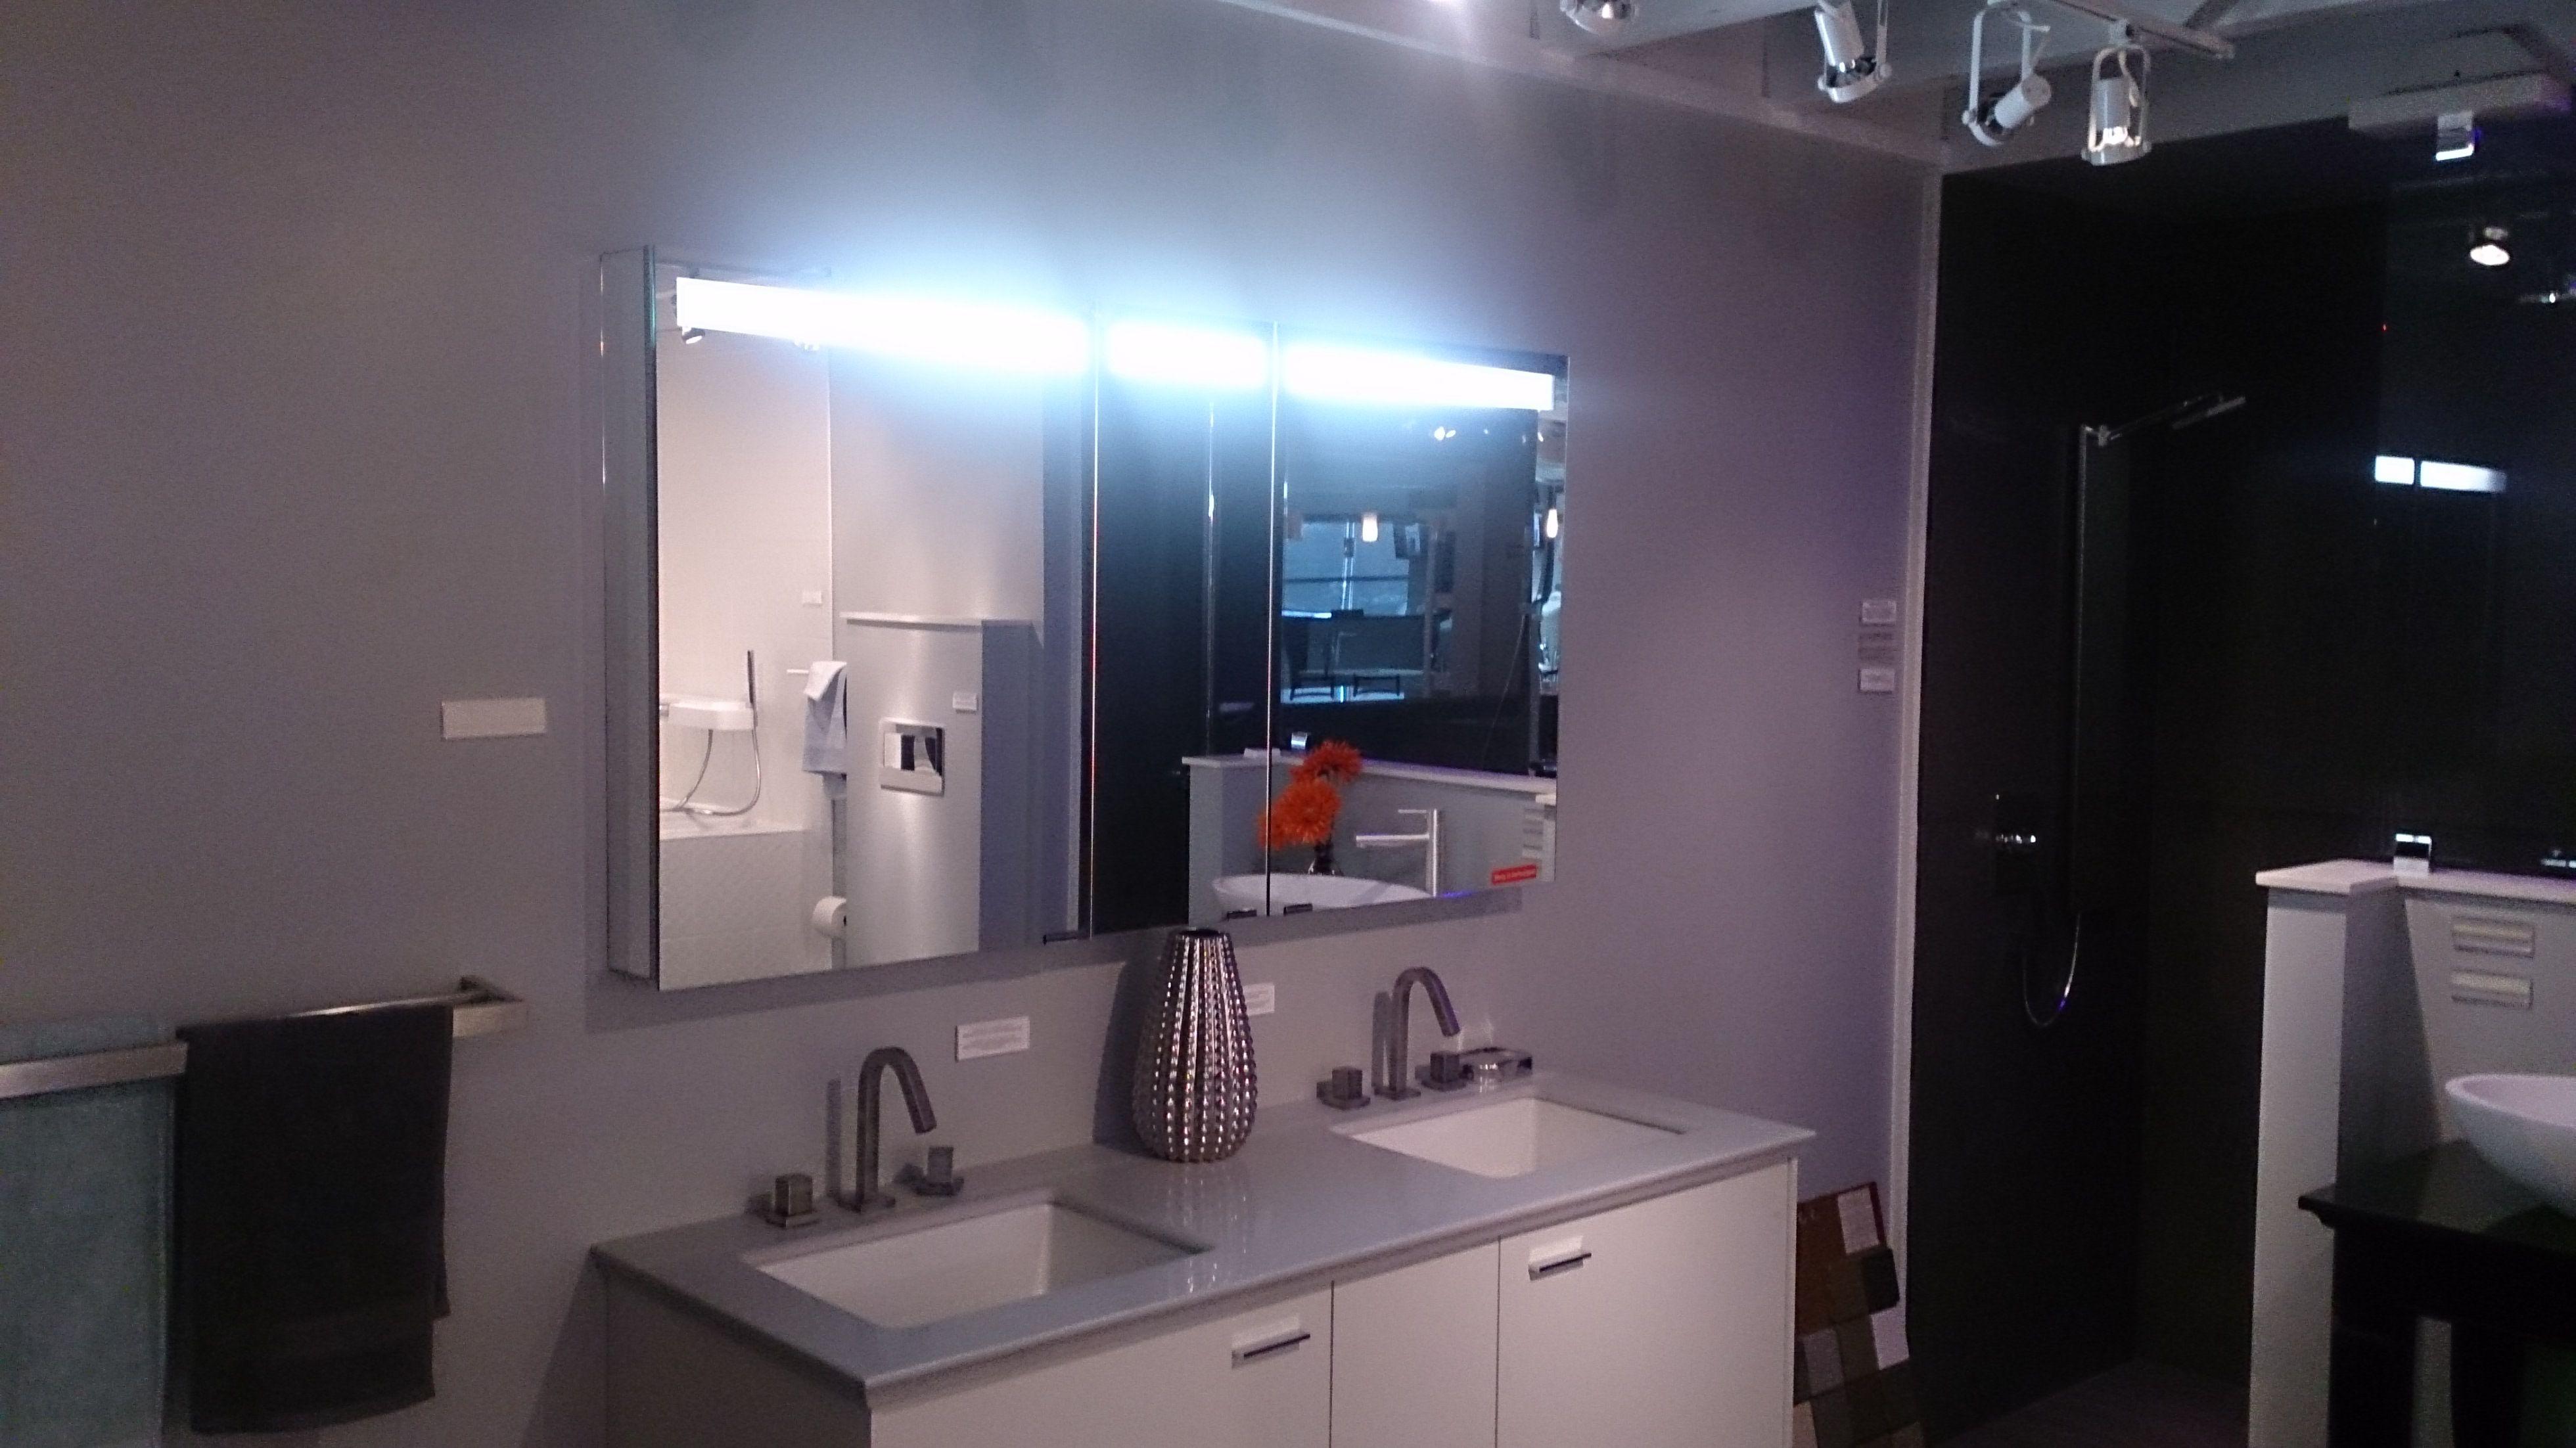 Triple Door Sidler Diamando Mirrored Medicine Cabinet With Built In